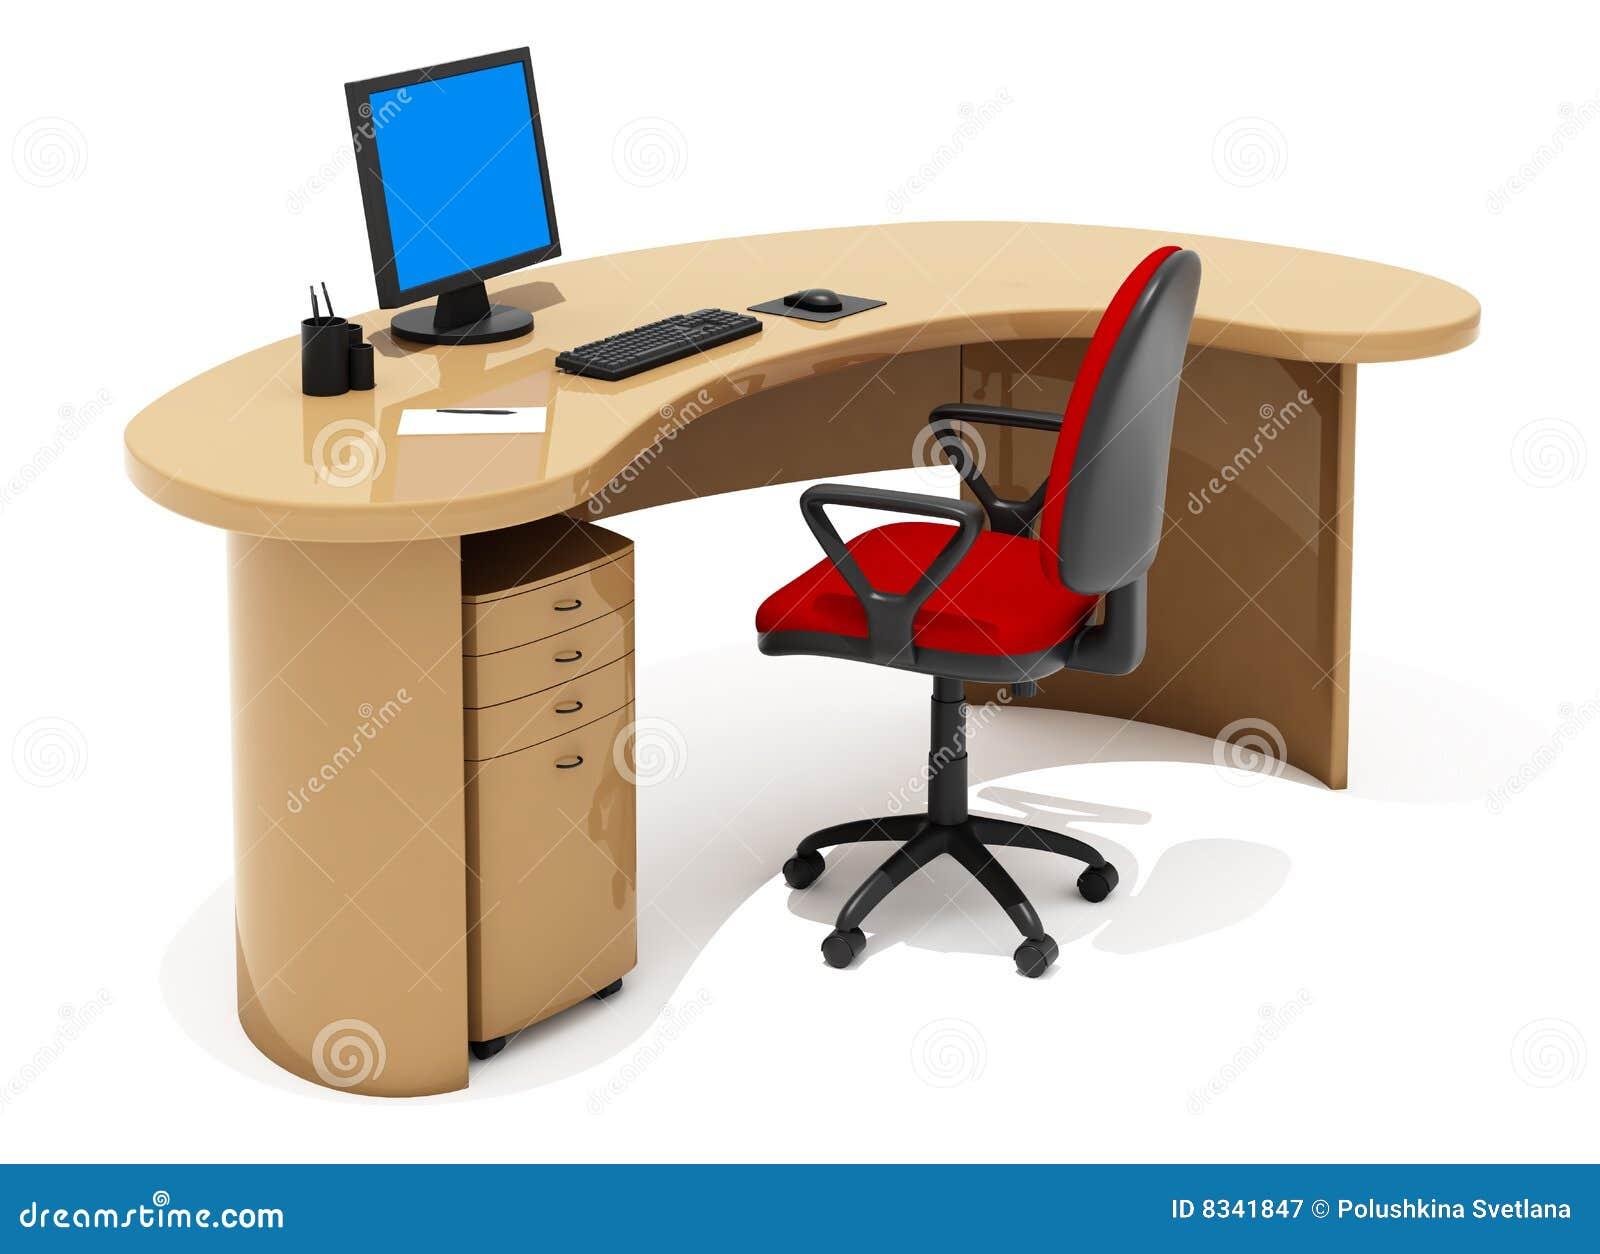 Office Furniture Stock Illustration. Illustration Of Easy